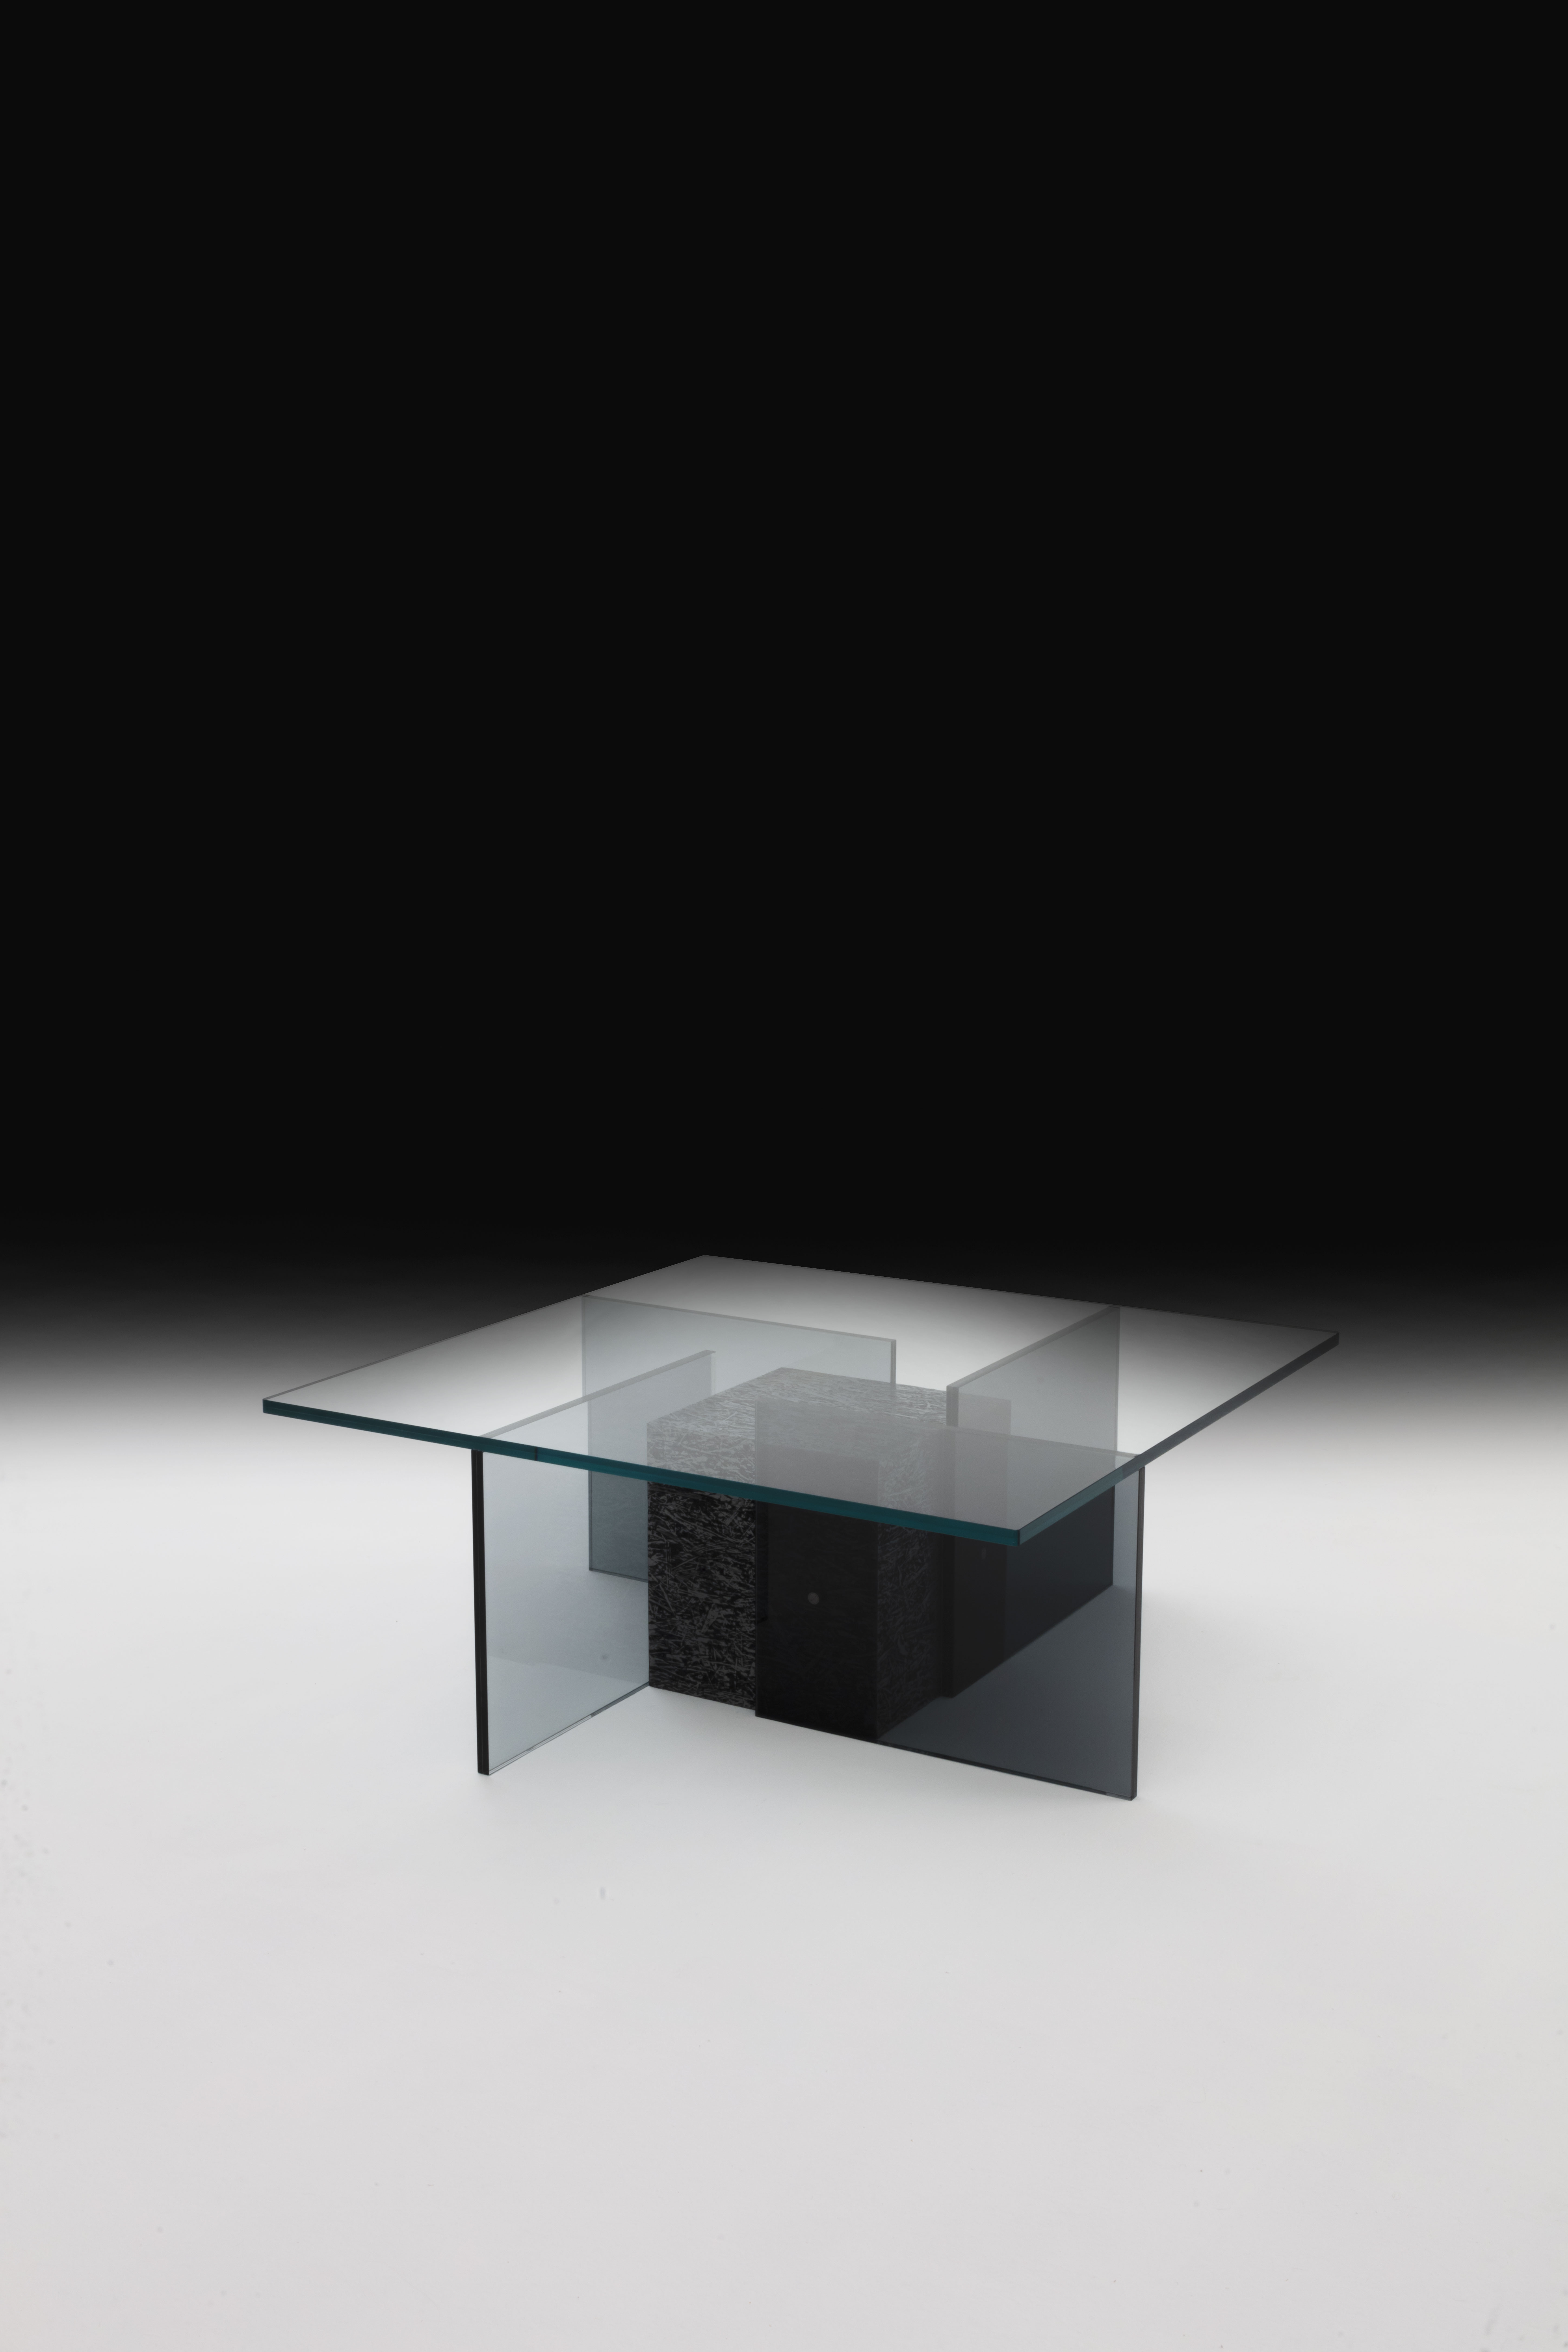 santambrogiomilano collections rh santambrogiomilano com Glass Office Furniture Glass Office Furniture